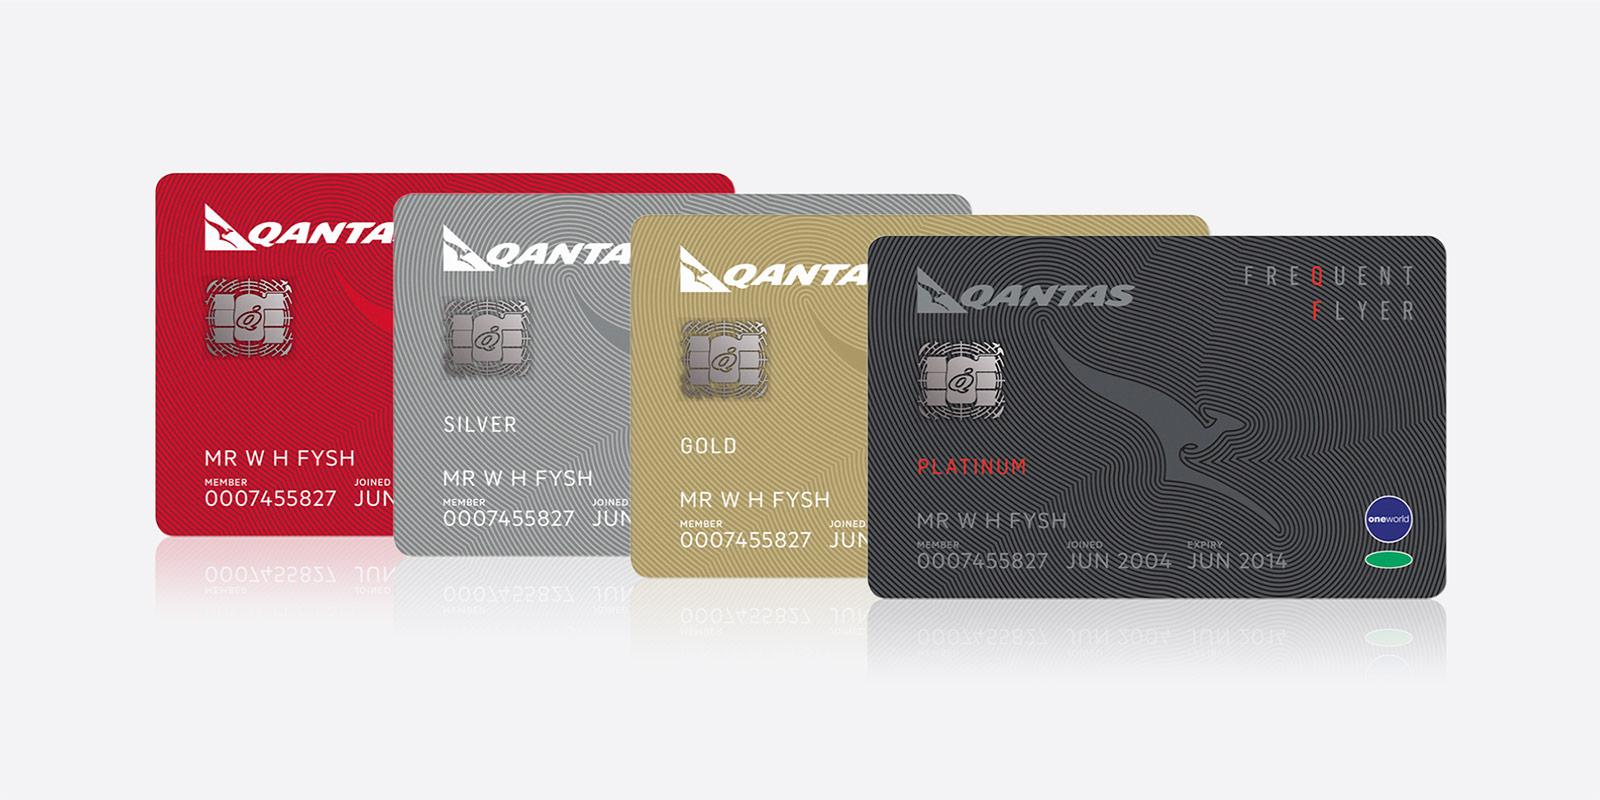 Qantas Status (Image: Houstongroup.com.au)